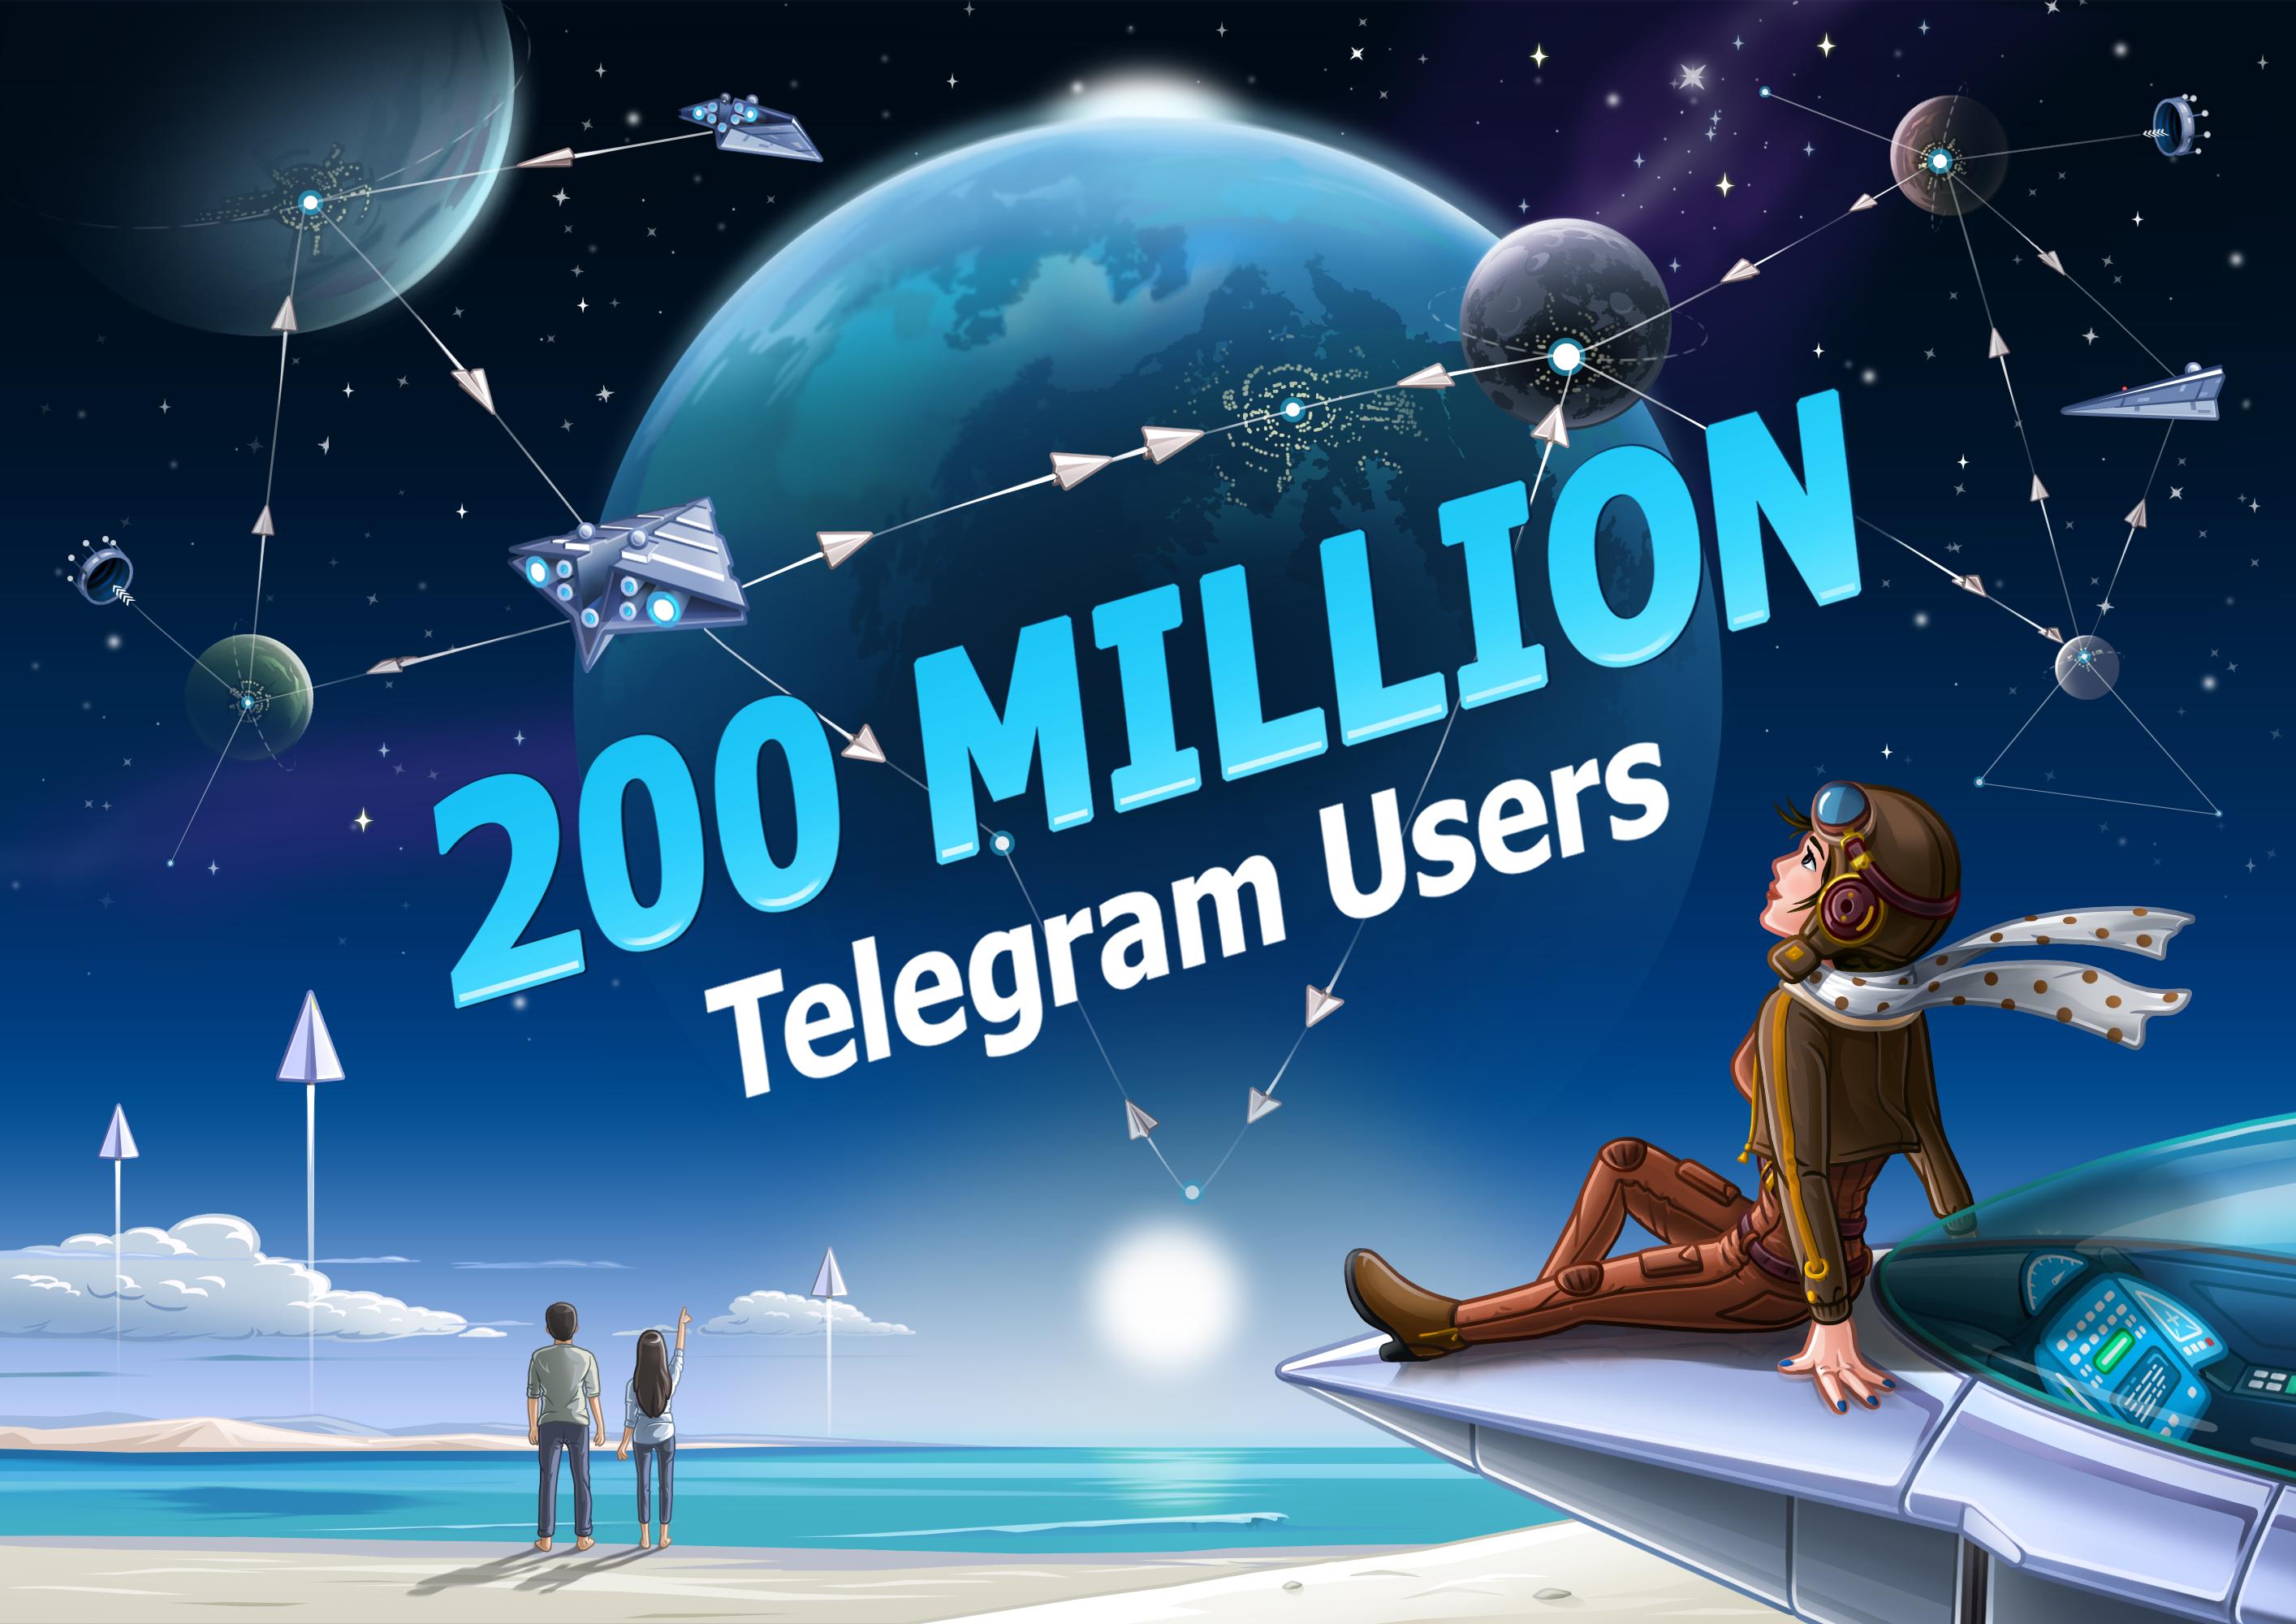 telegram downloads